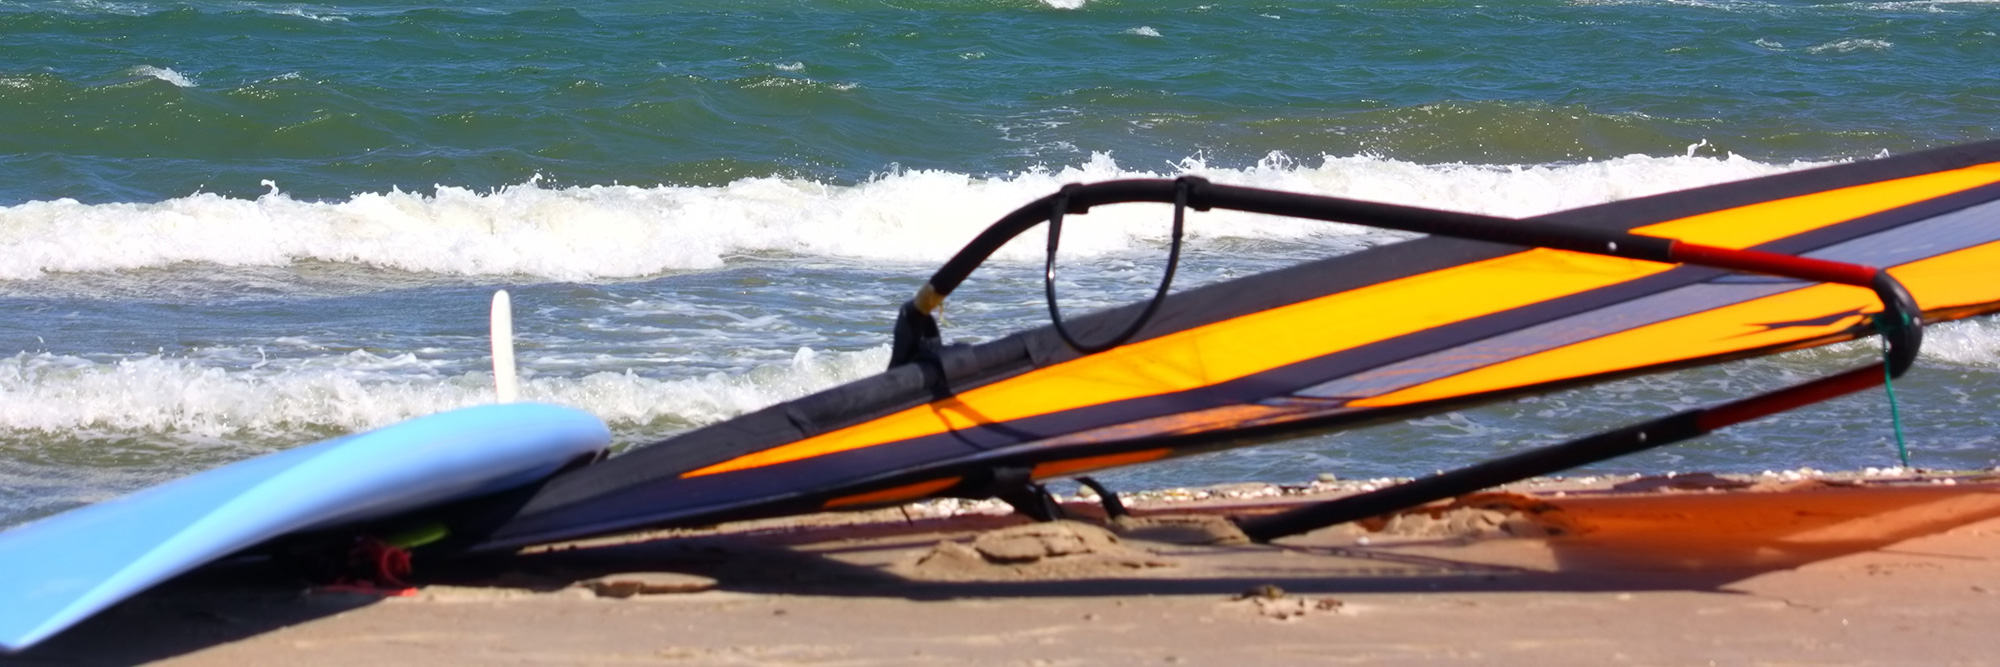 Initiation au windsurf